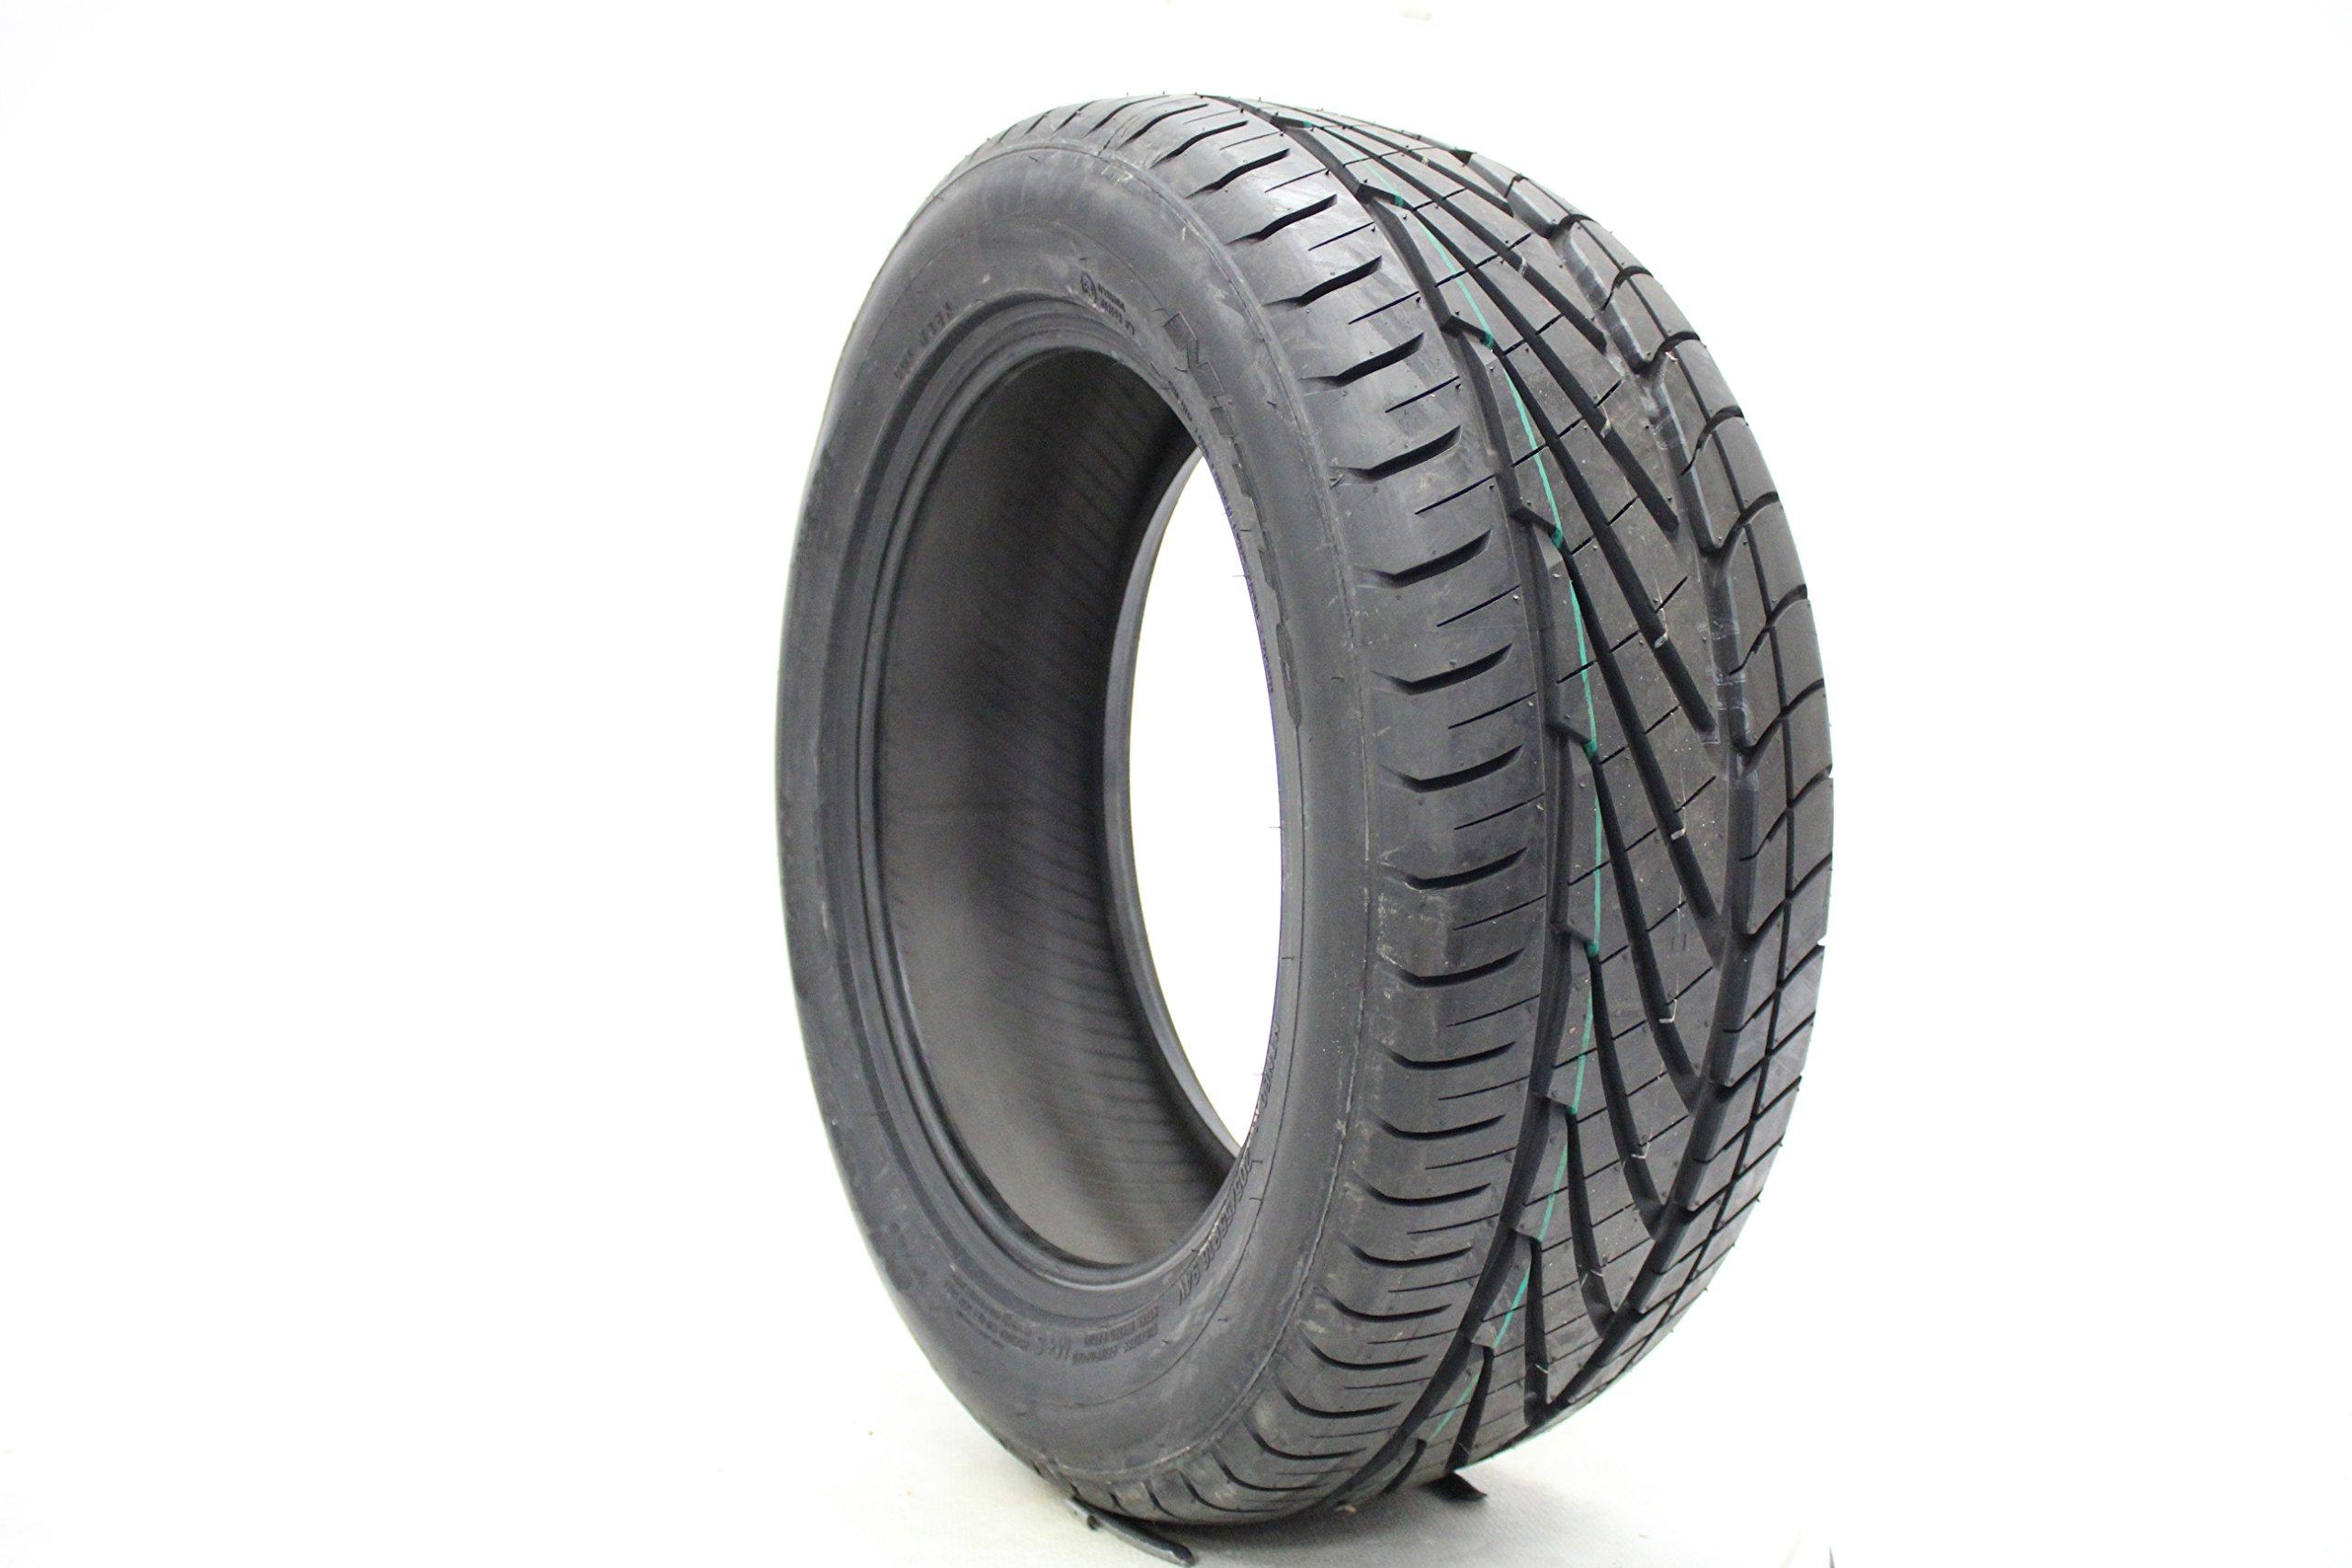 Nitto Neo Gen All-Season Radial Tire - 225/35R20 90W